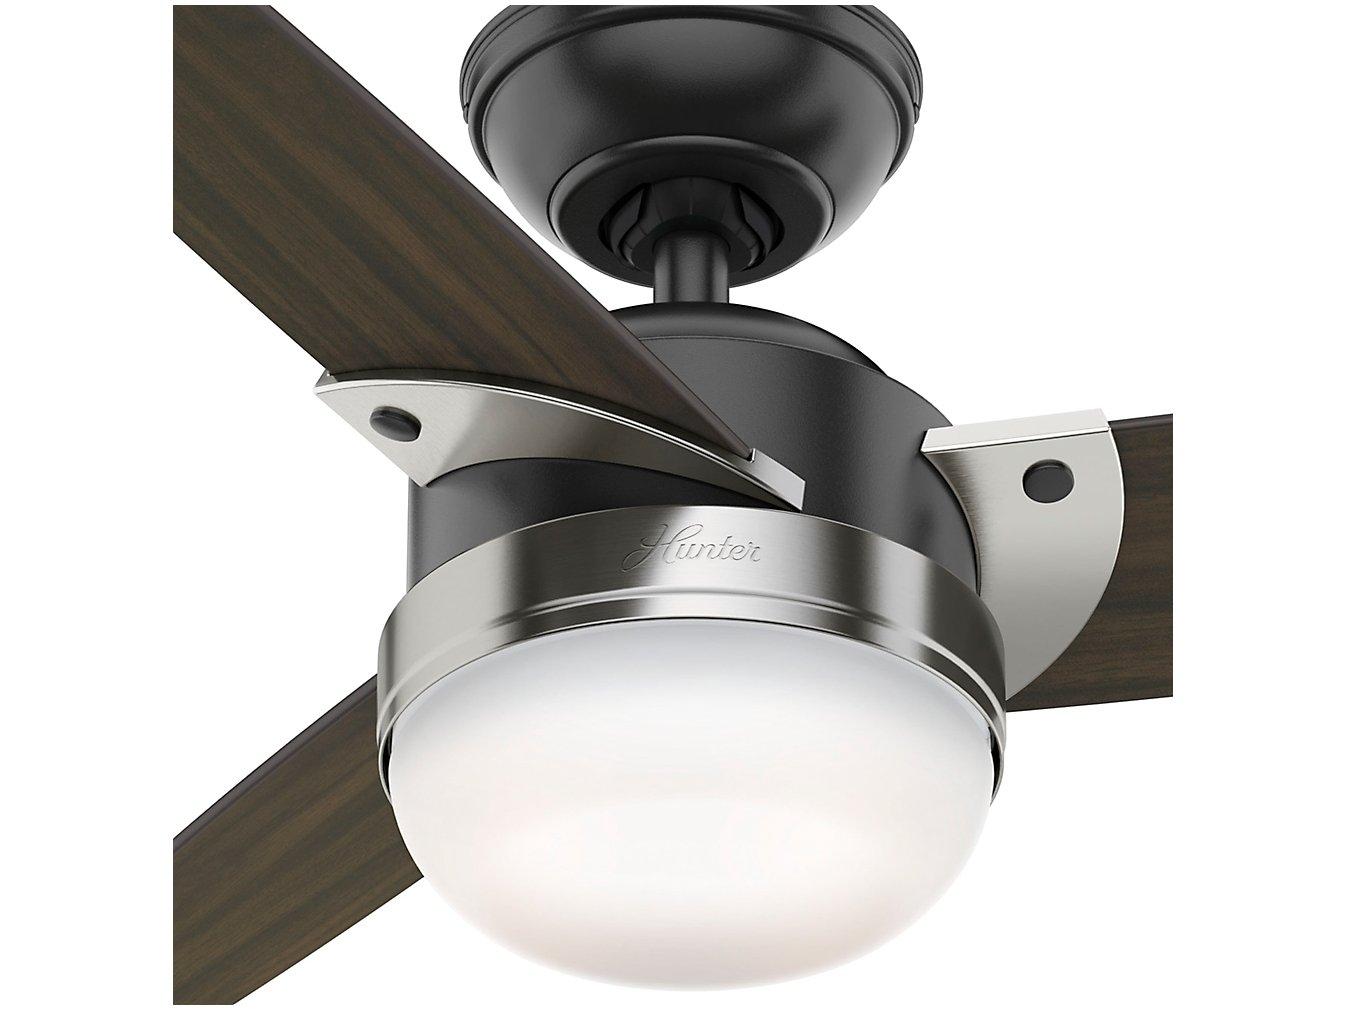 Ventilador de Teto Hunter Nova 3 Pás 3 Velocidades - Preto Fosco e Nogueira Escura para 2 Lâmpadas - 220 V - 1